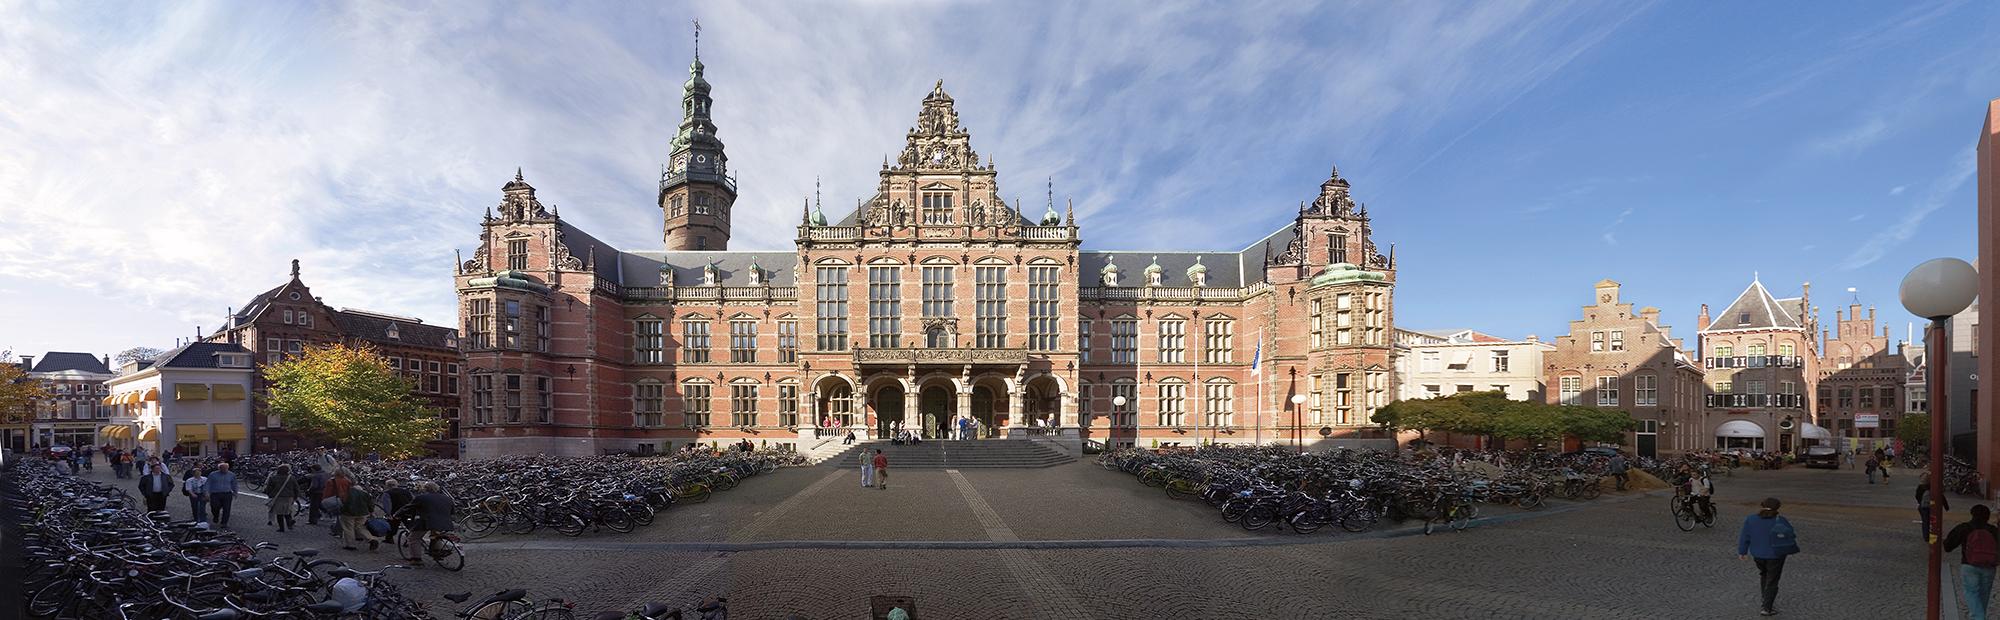 Rijksuniversiteit Groningen